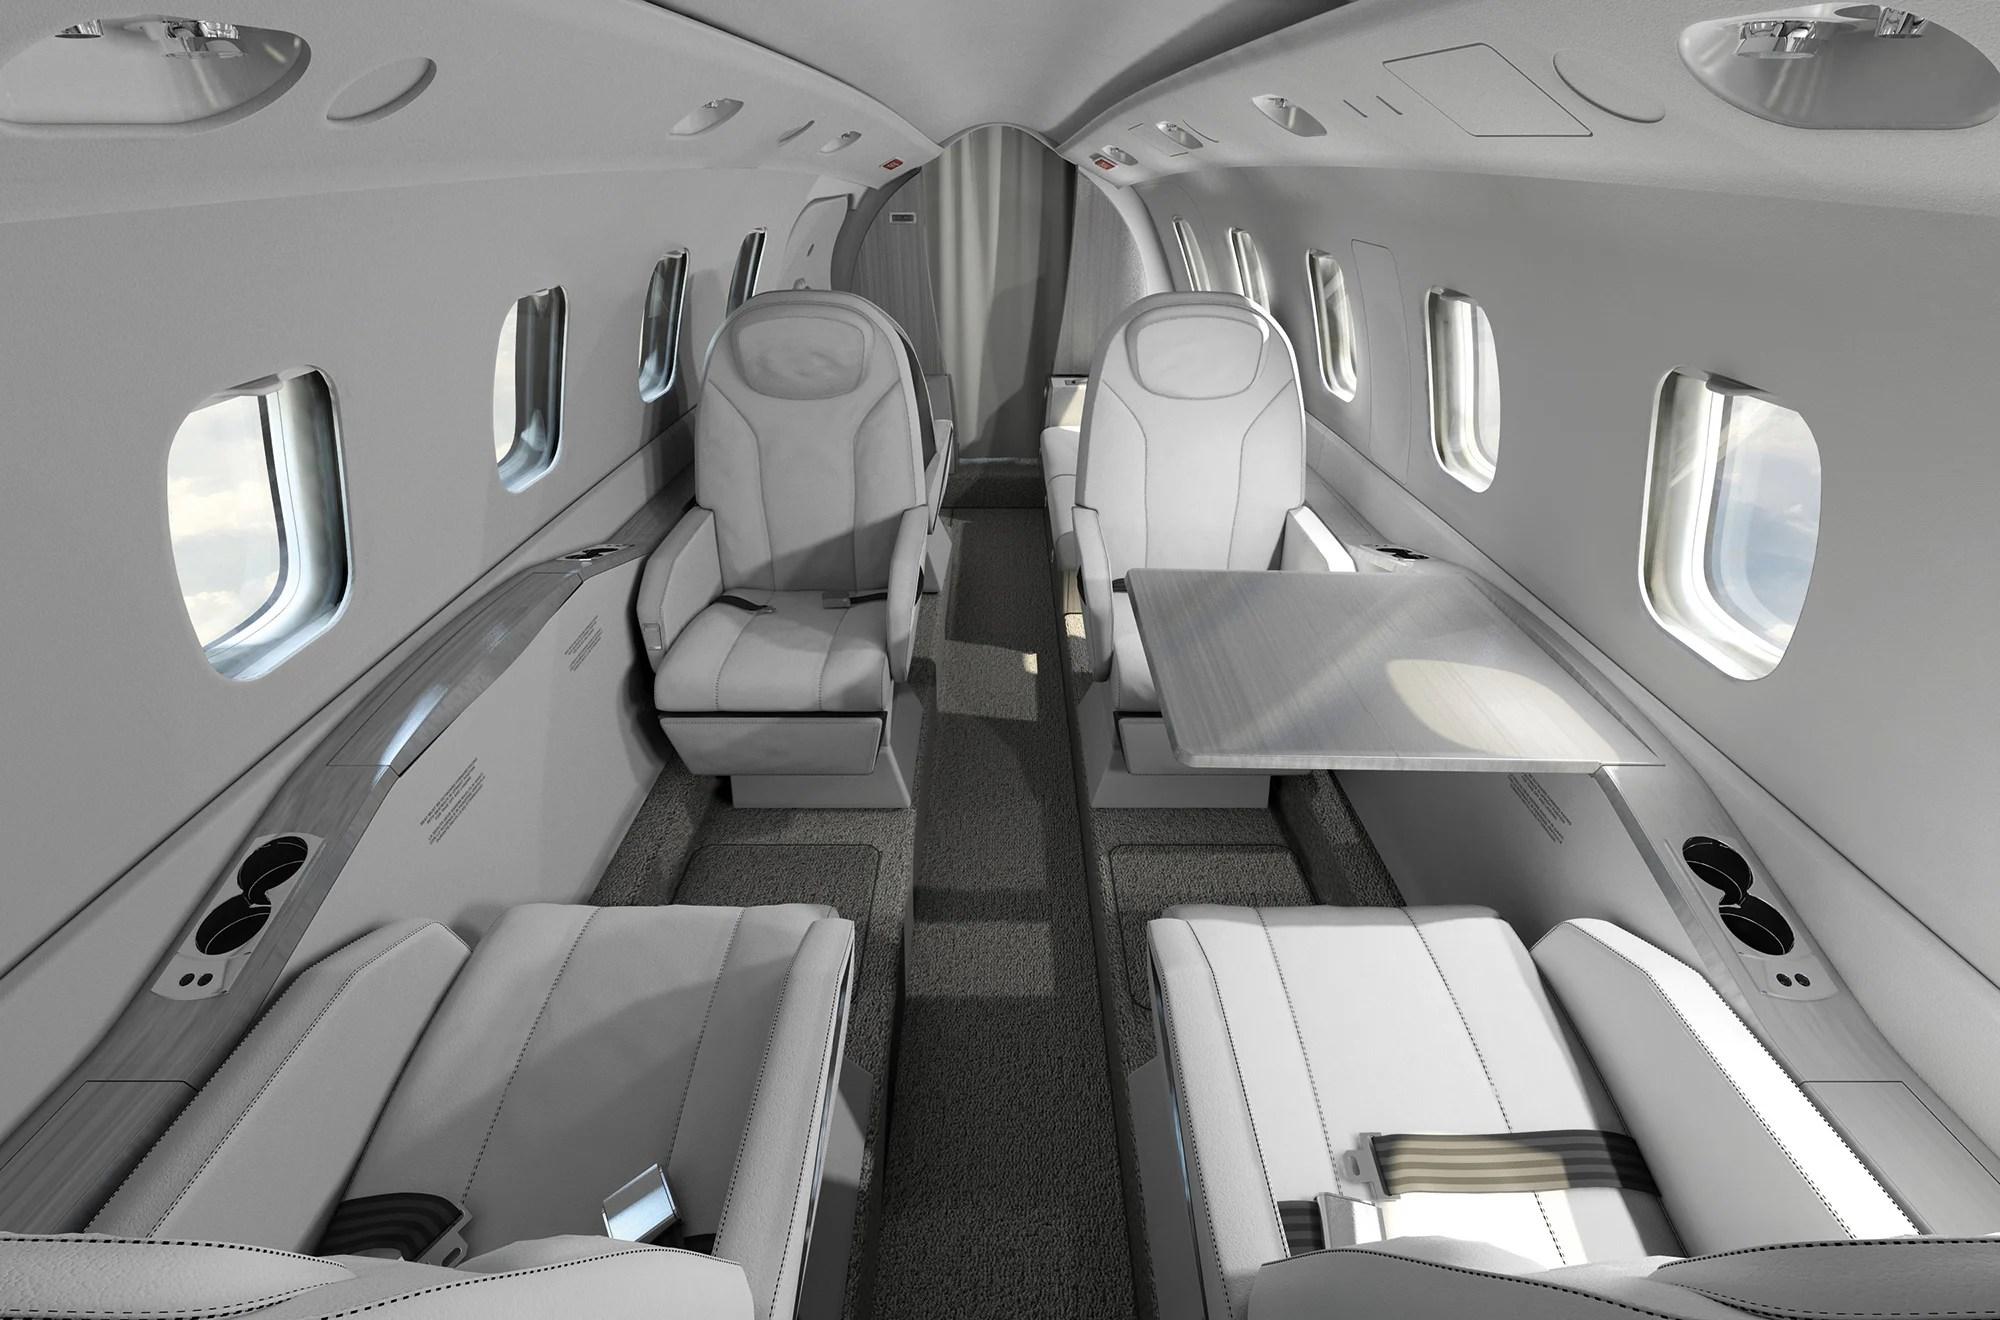 Piaggios Avanti Evo Twinturbo prop aircraft is greener and faster